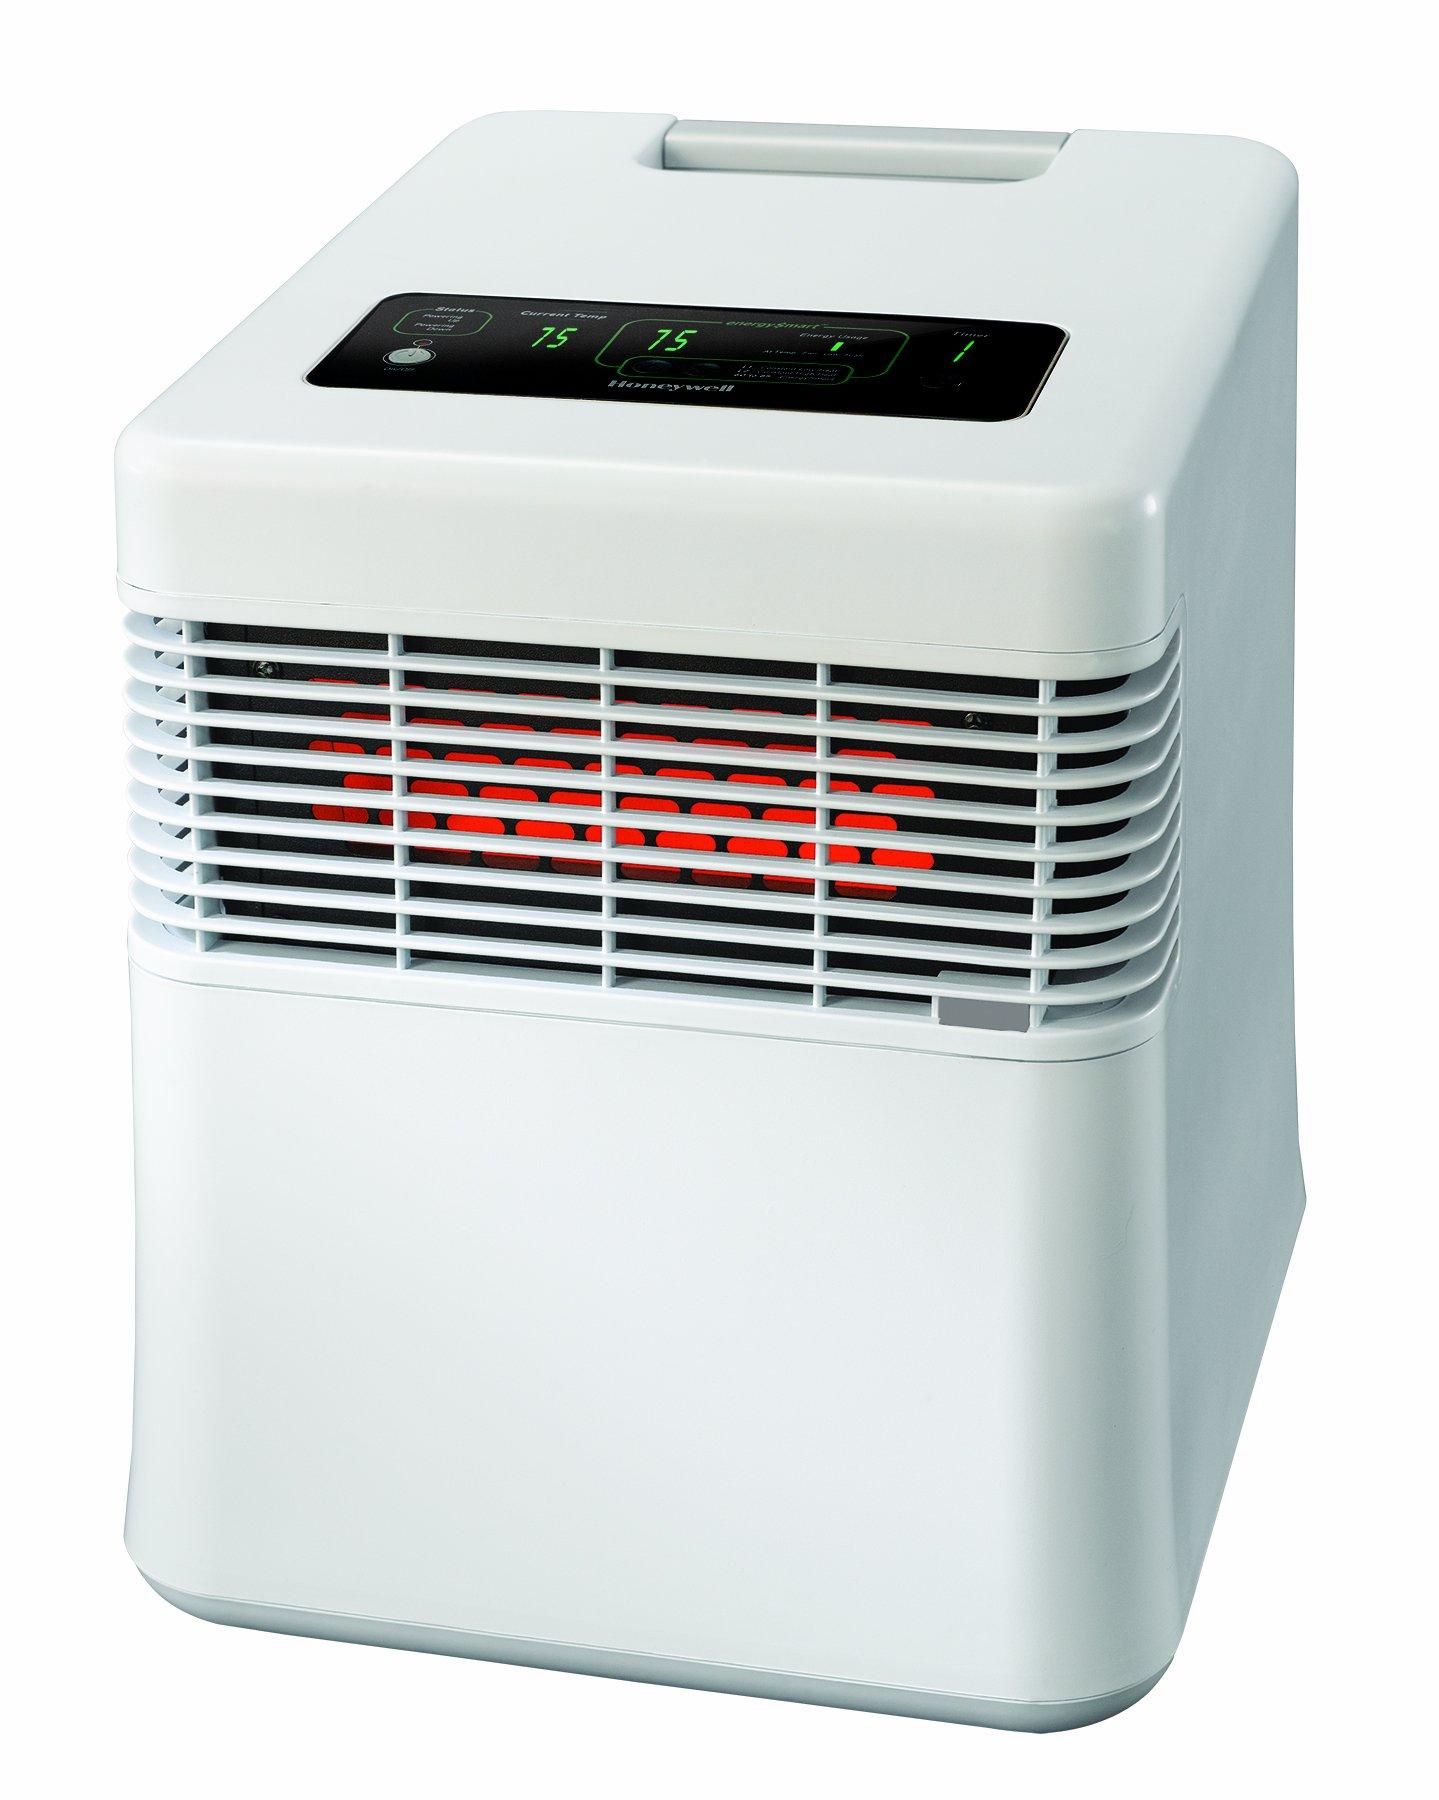 Honeywell EngergySmart Infared Whole Room Heater